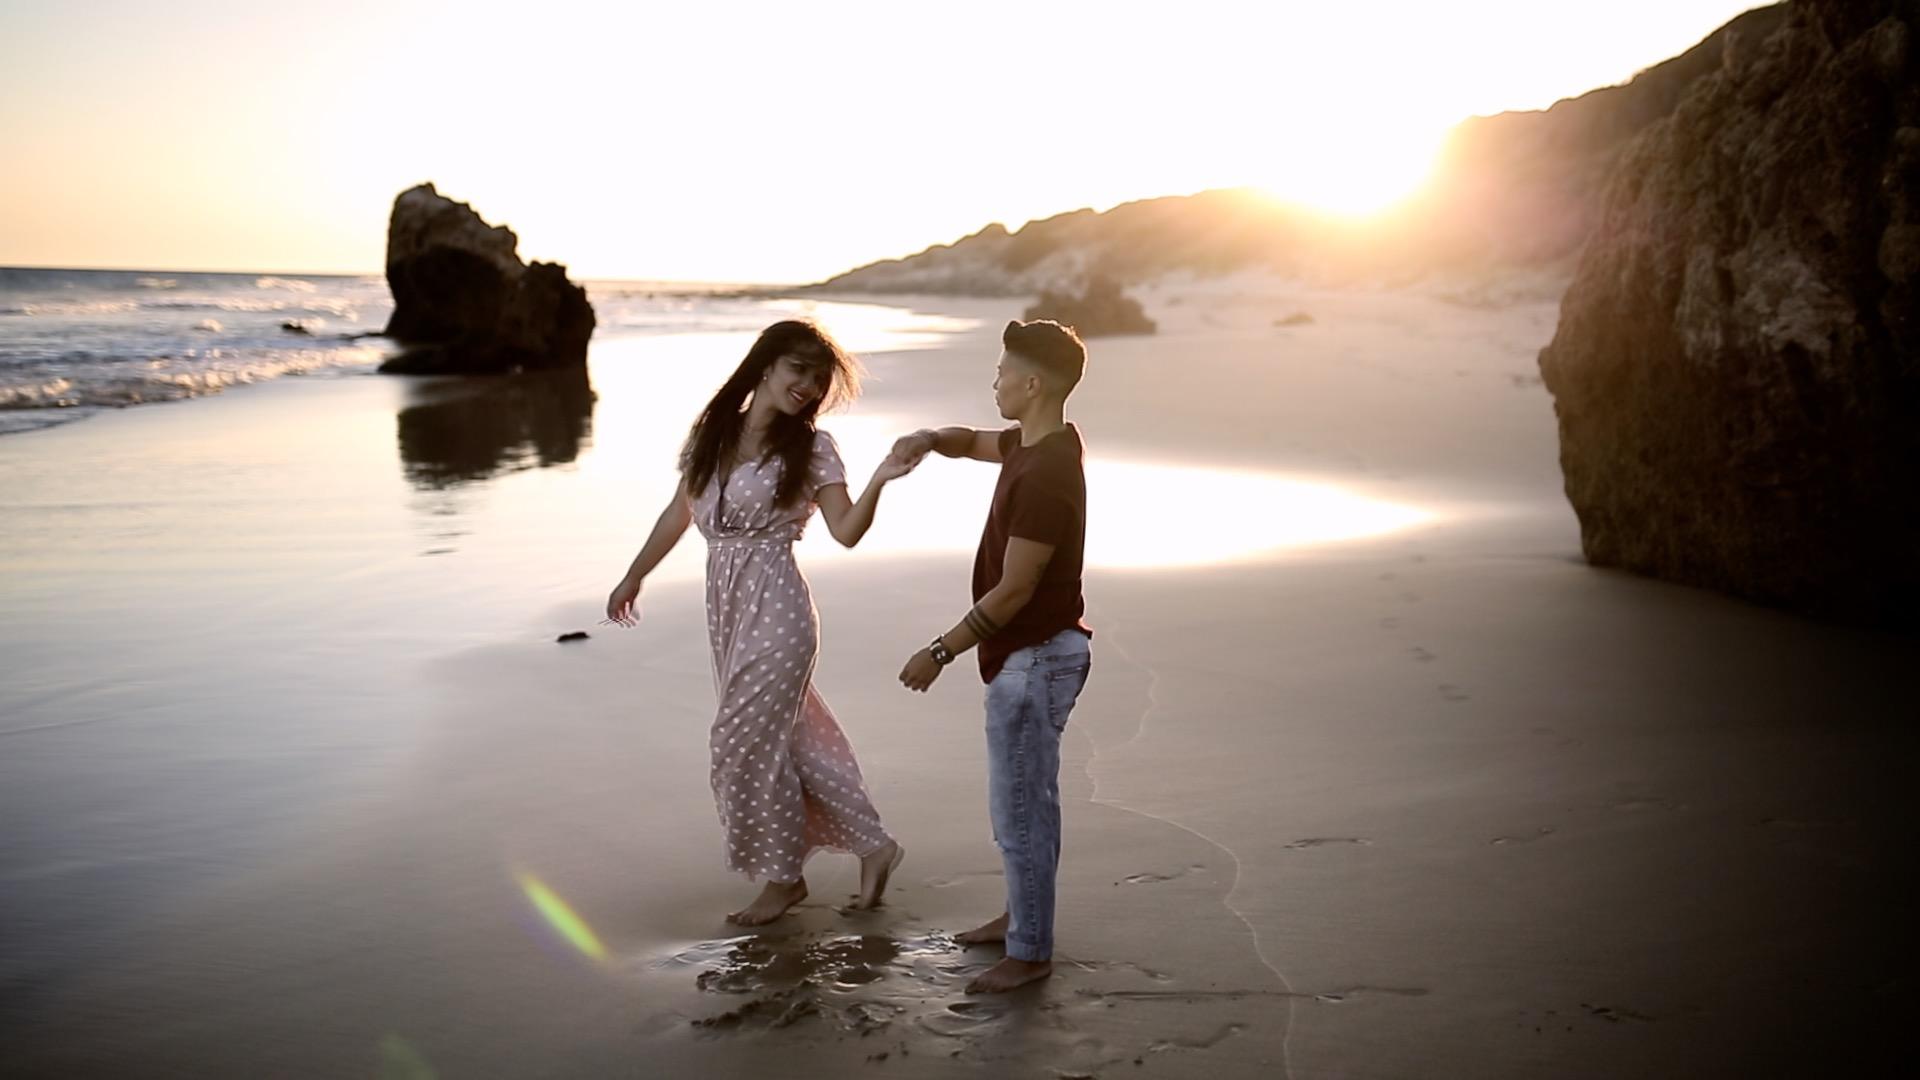 pareja jugando en la playa, fénix visual, tarifa